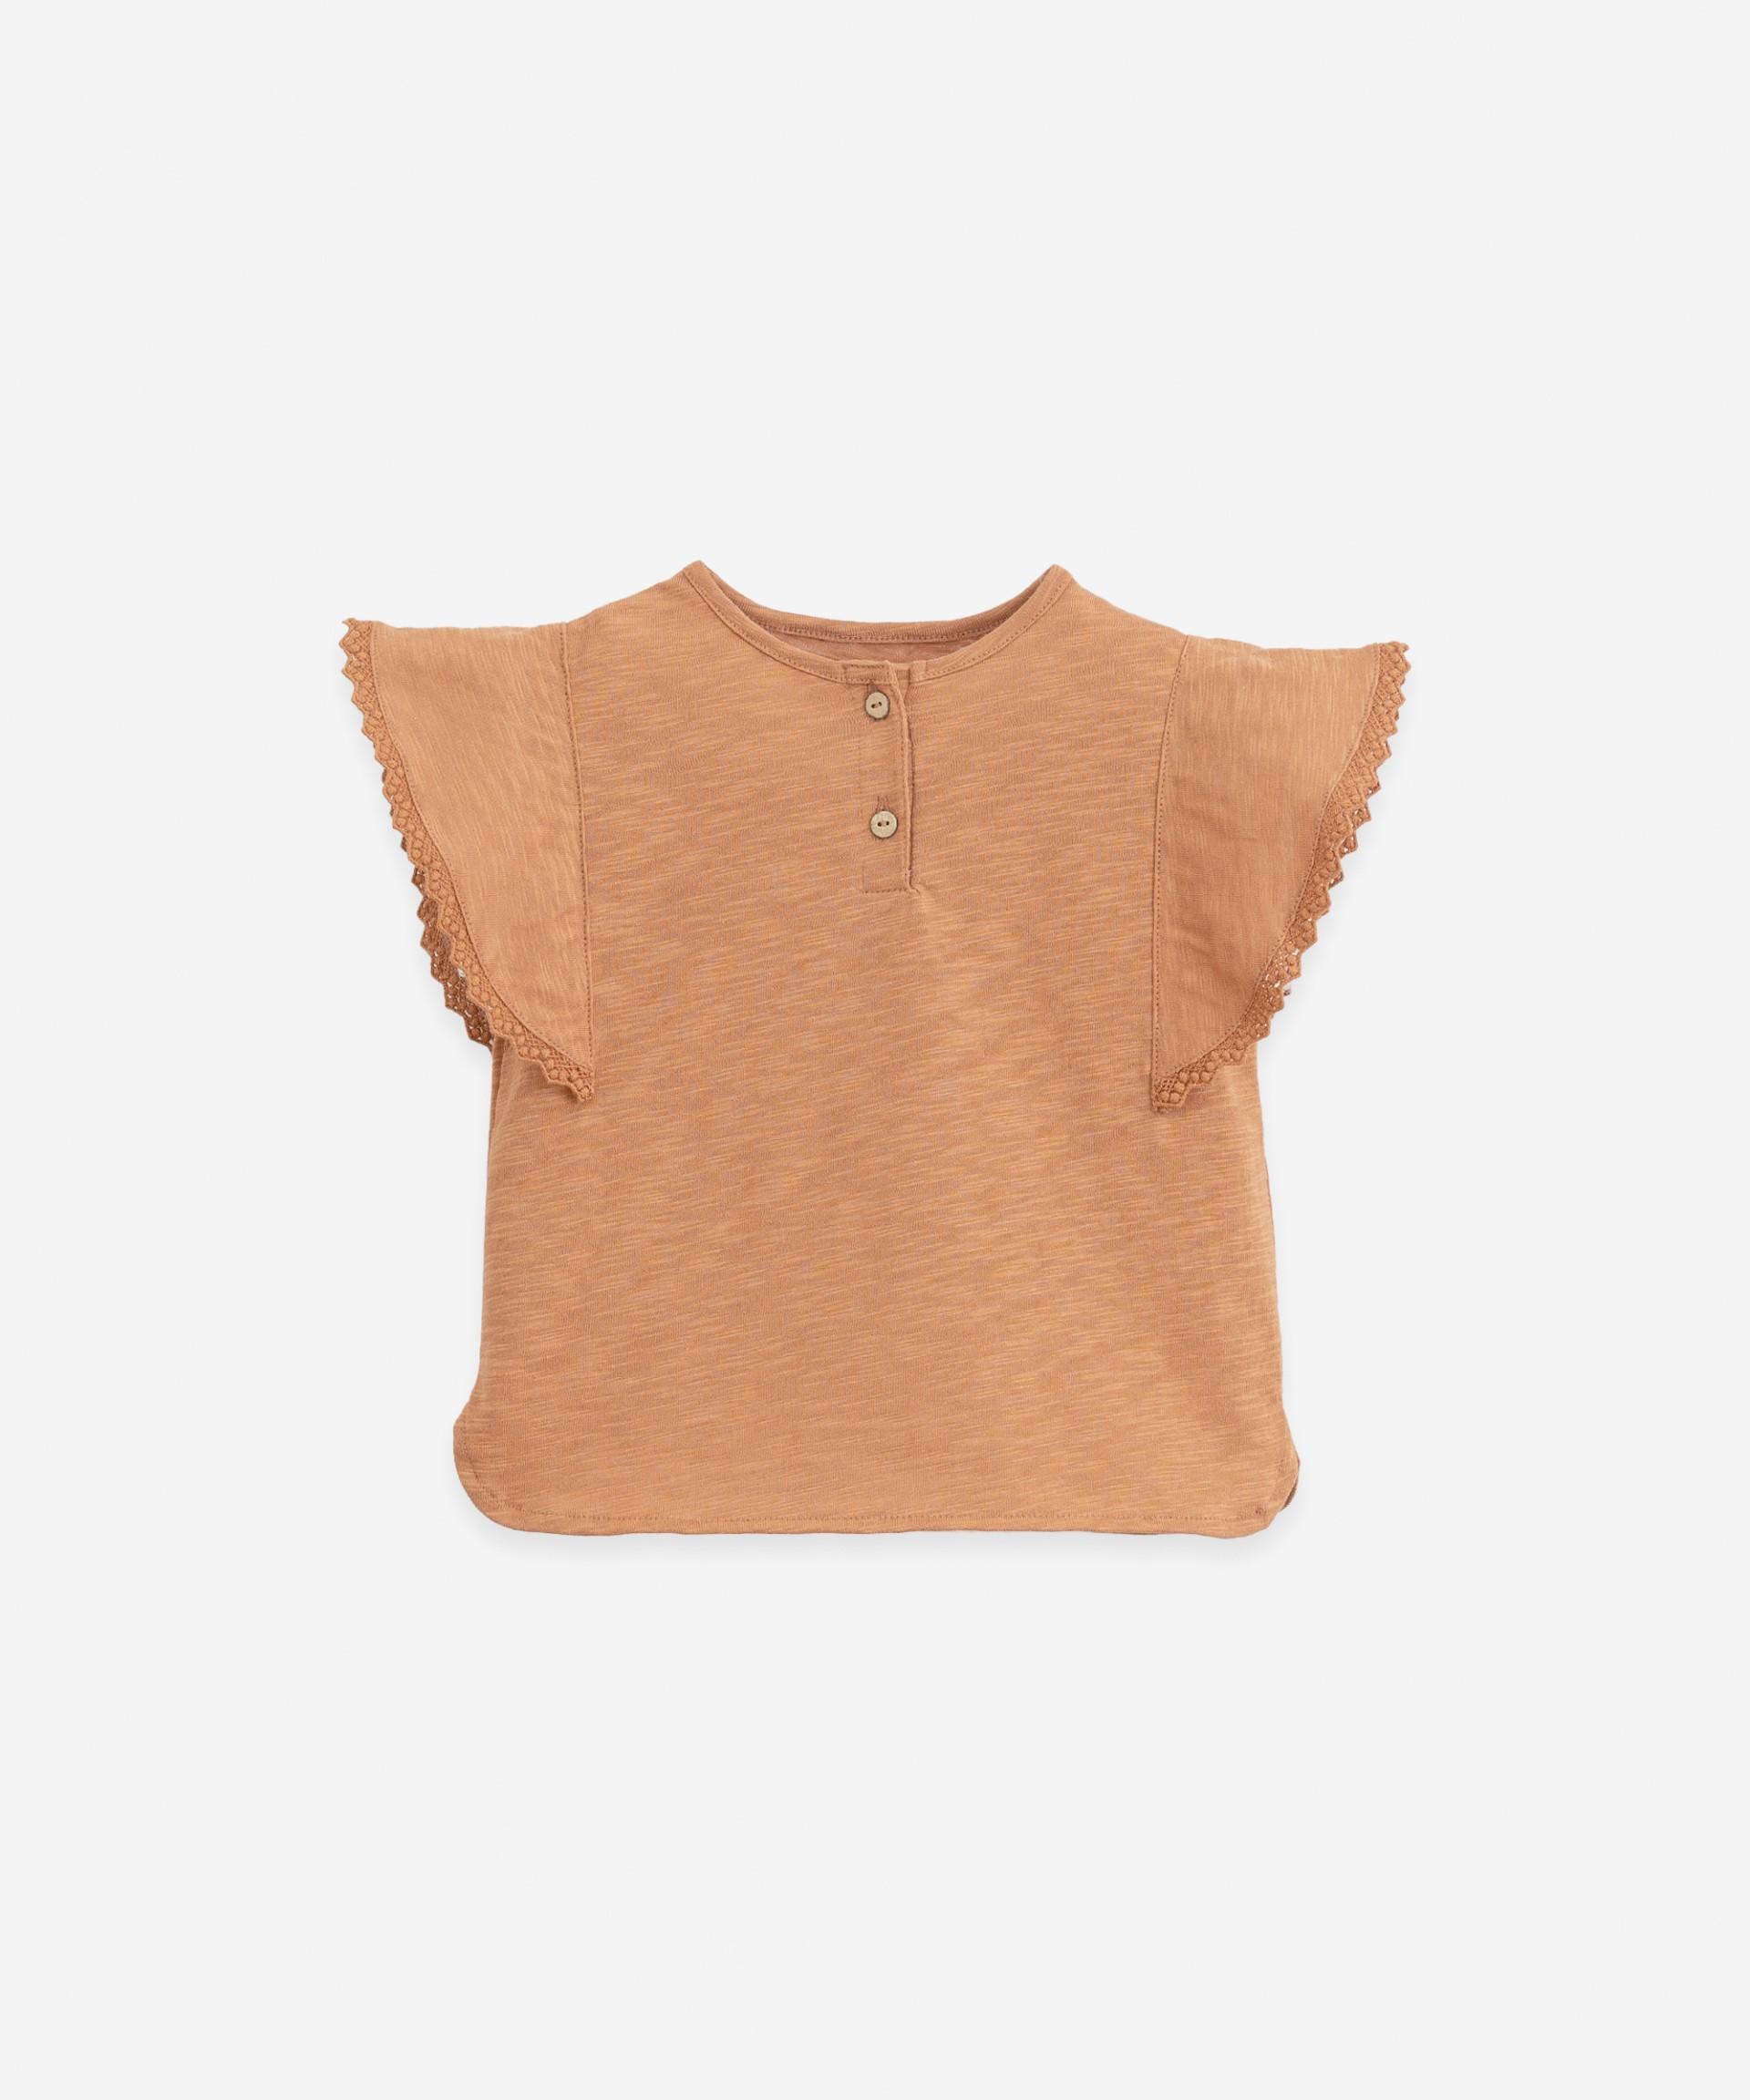 Organic cotton T-shirt | Botany